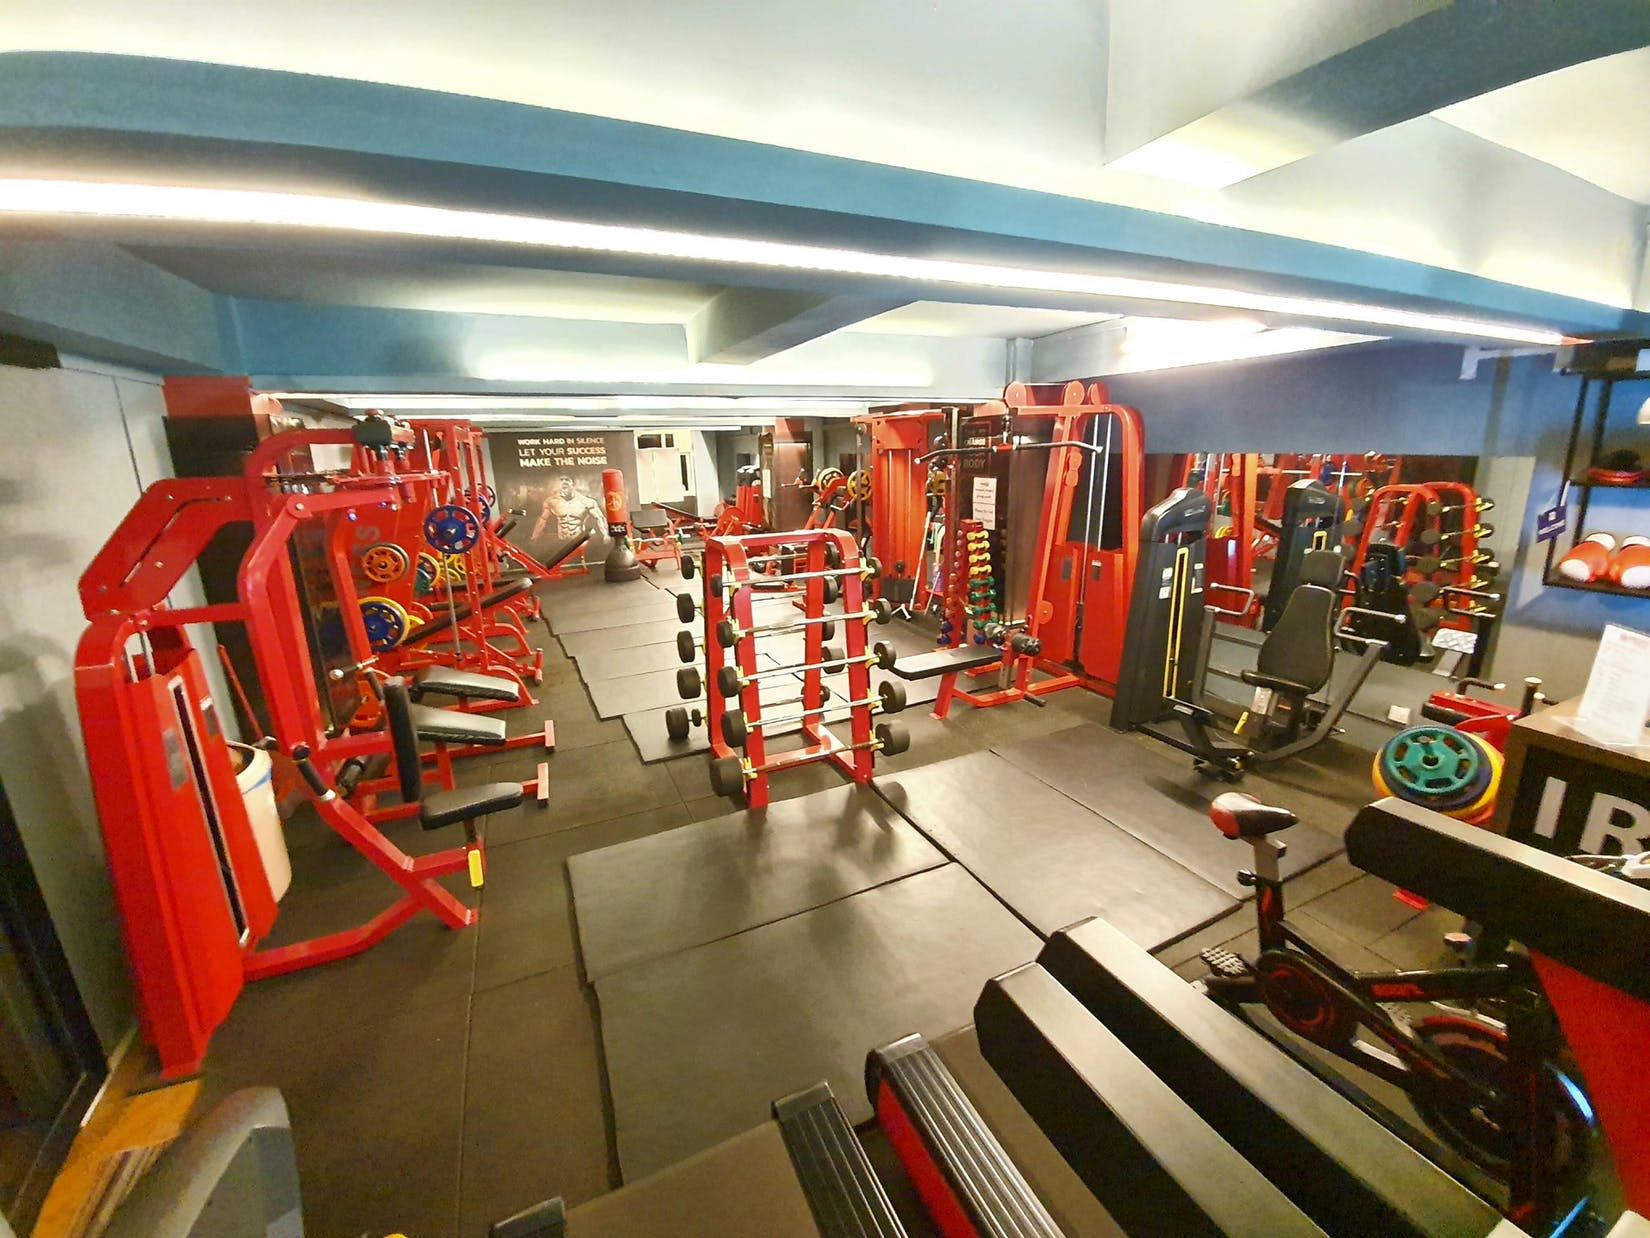 Iron Fitness | Beauty